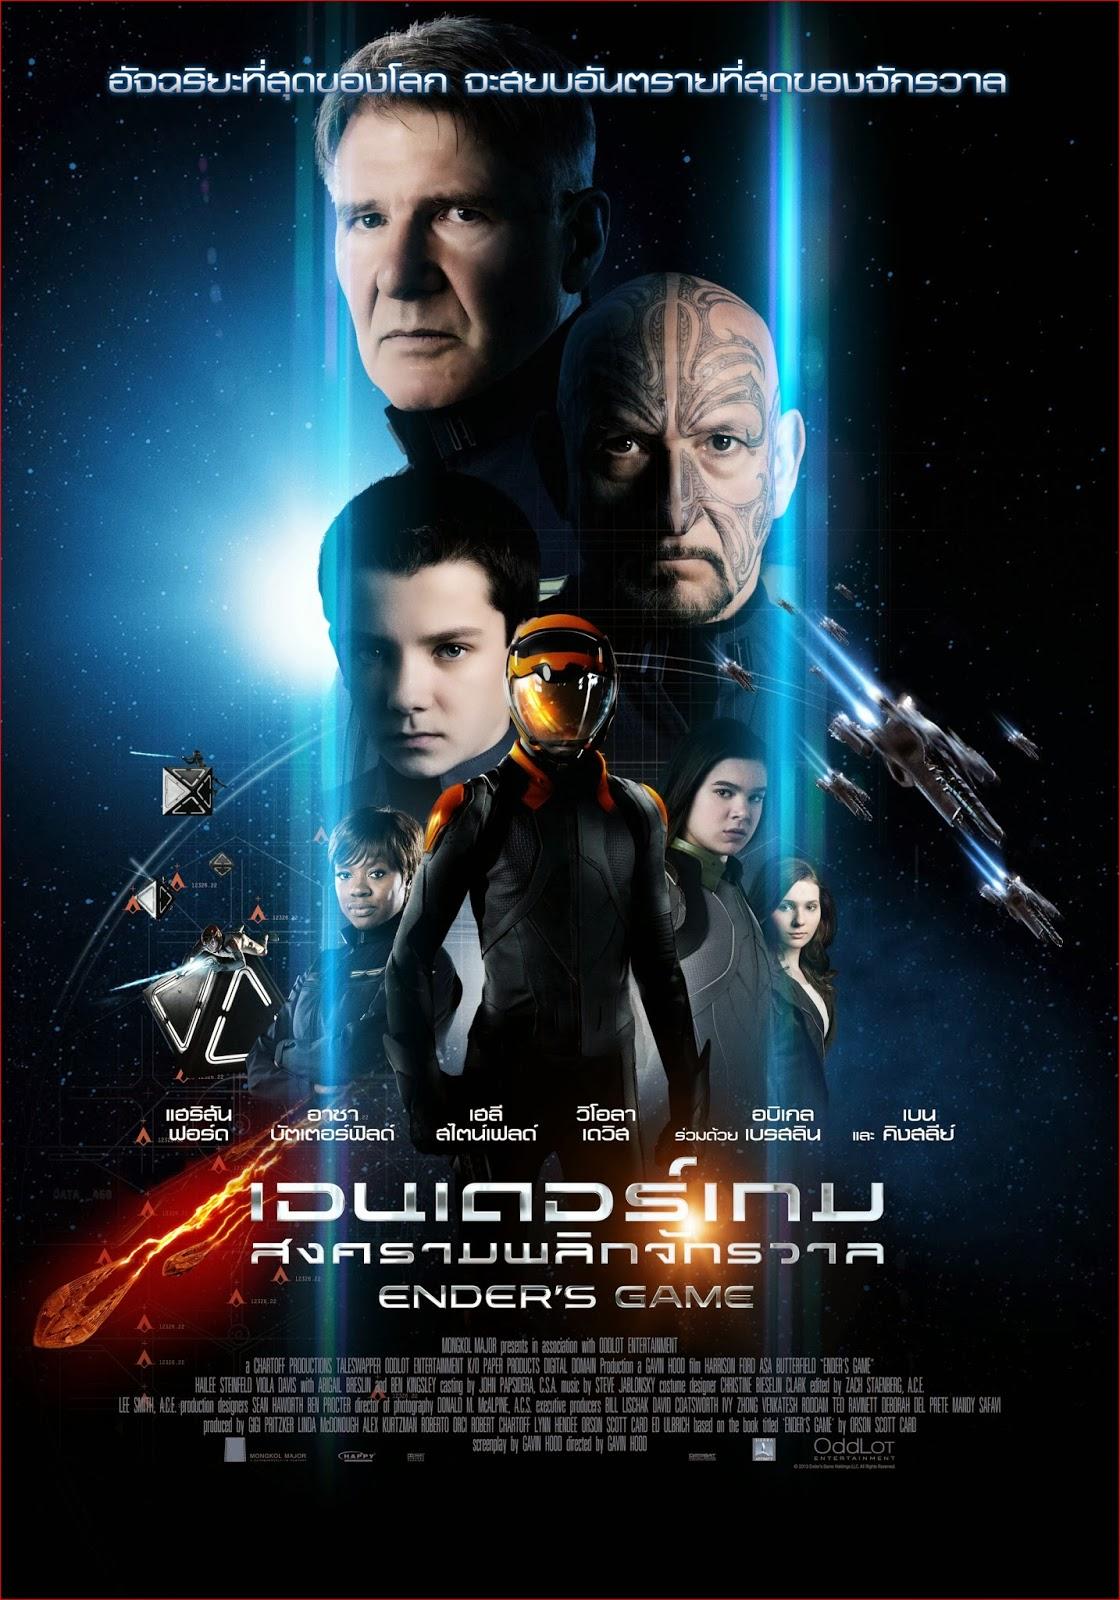 Ender's Game | Teaser Trailer